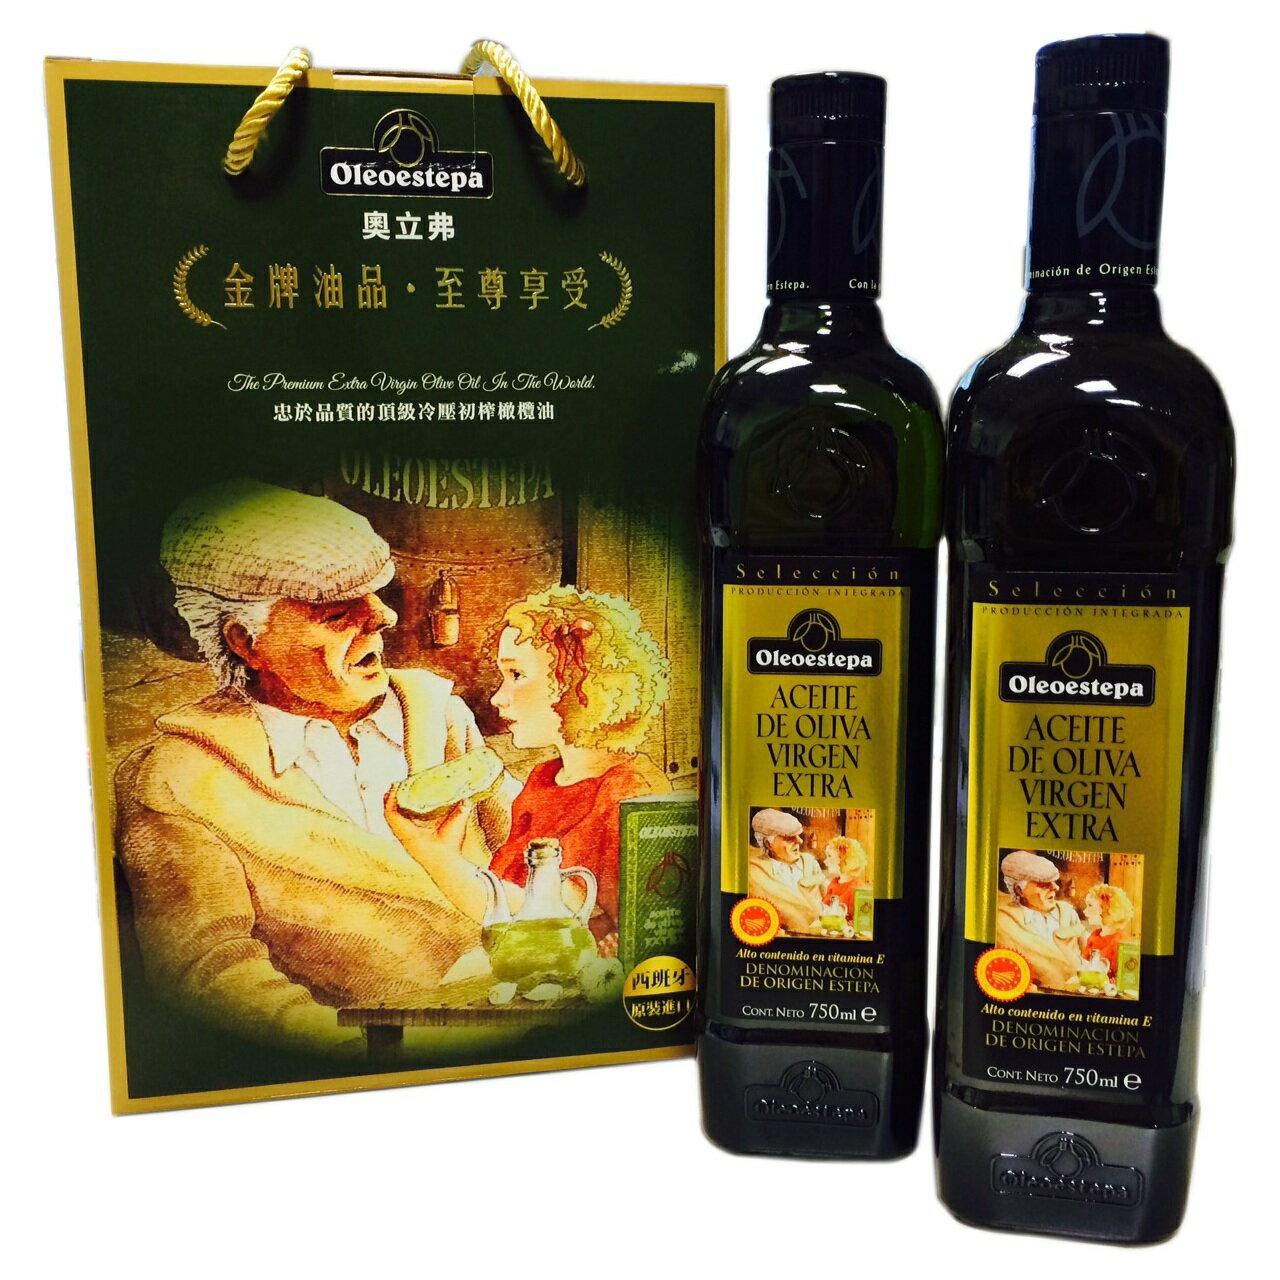 Oleoestepa 奧立弗★頂級(特級)初榨橄欖油禮盒組★【750mlx2入】 0